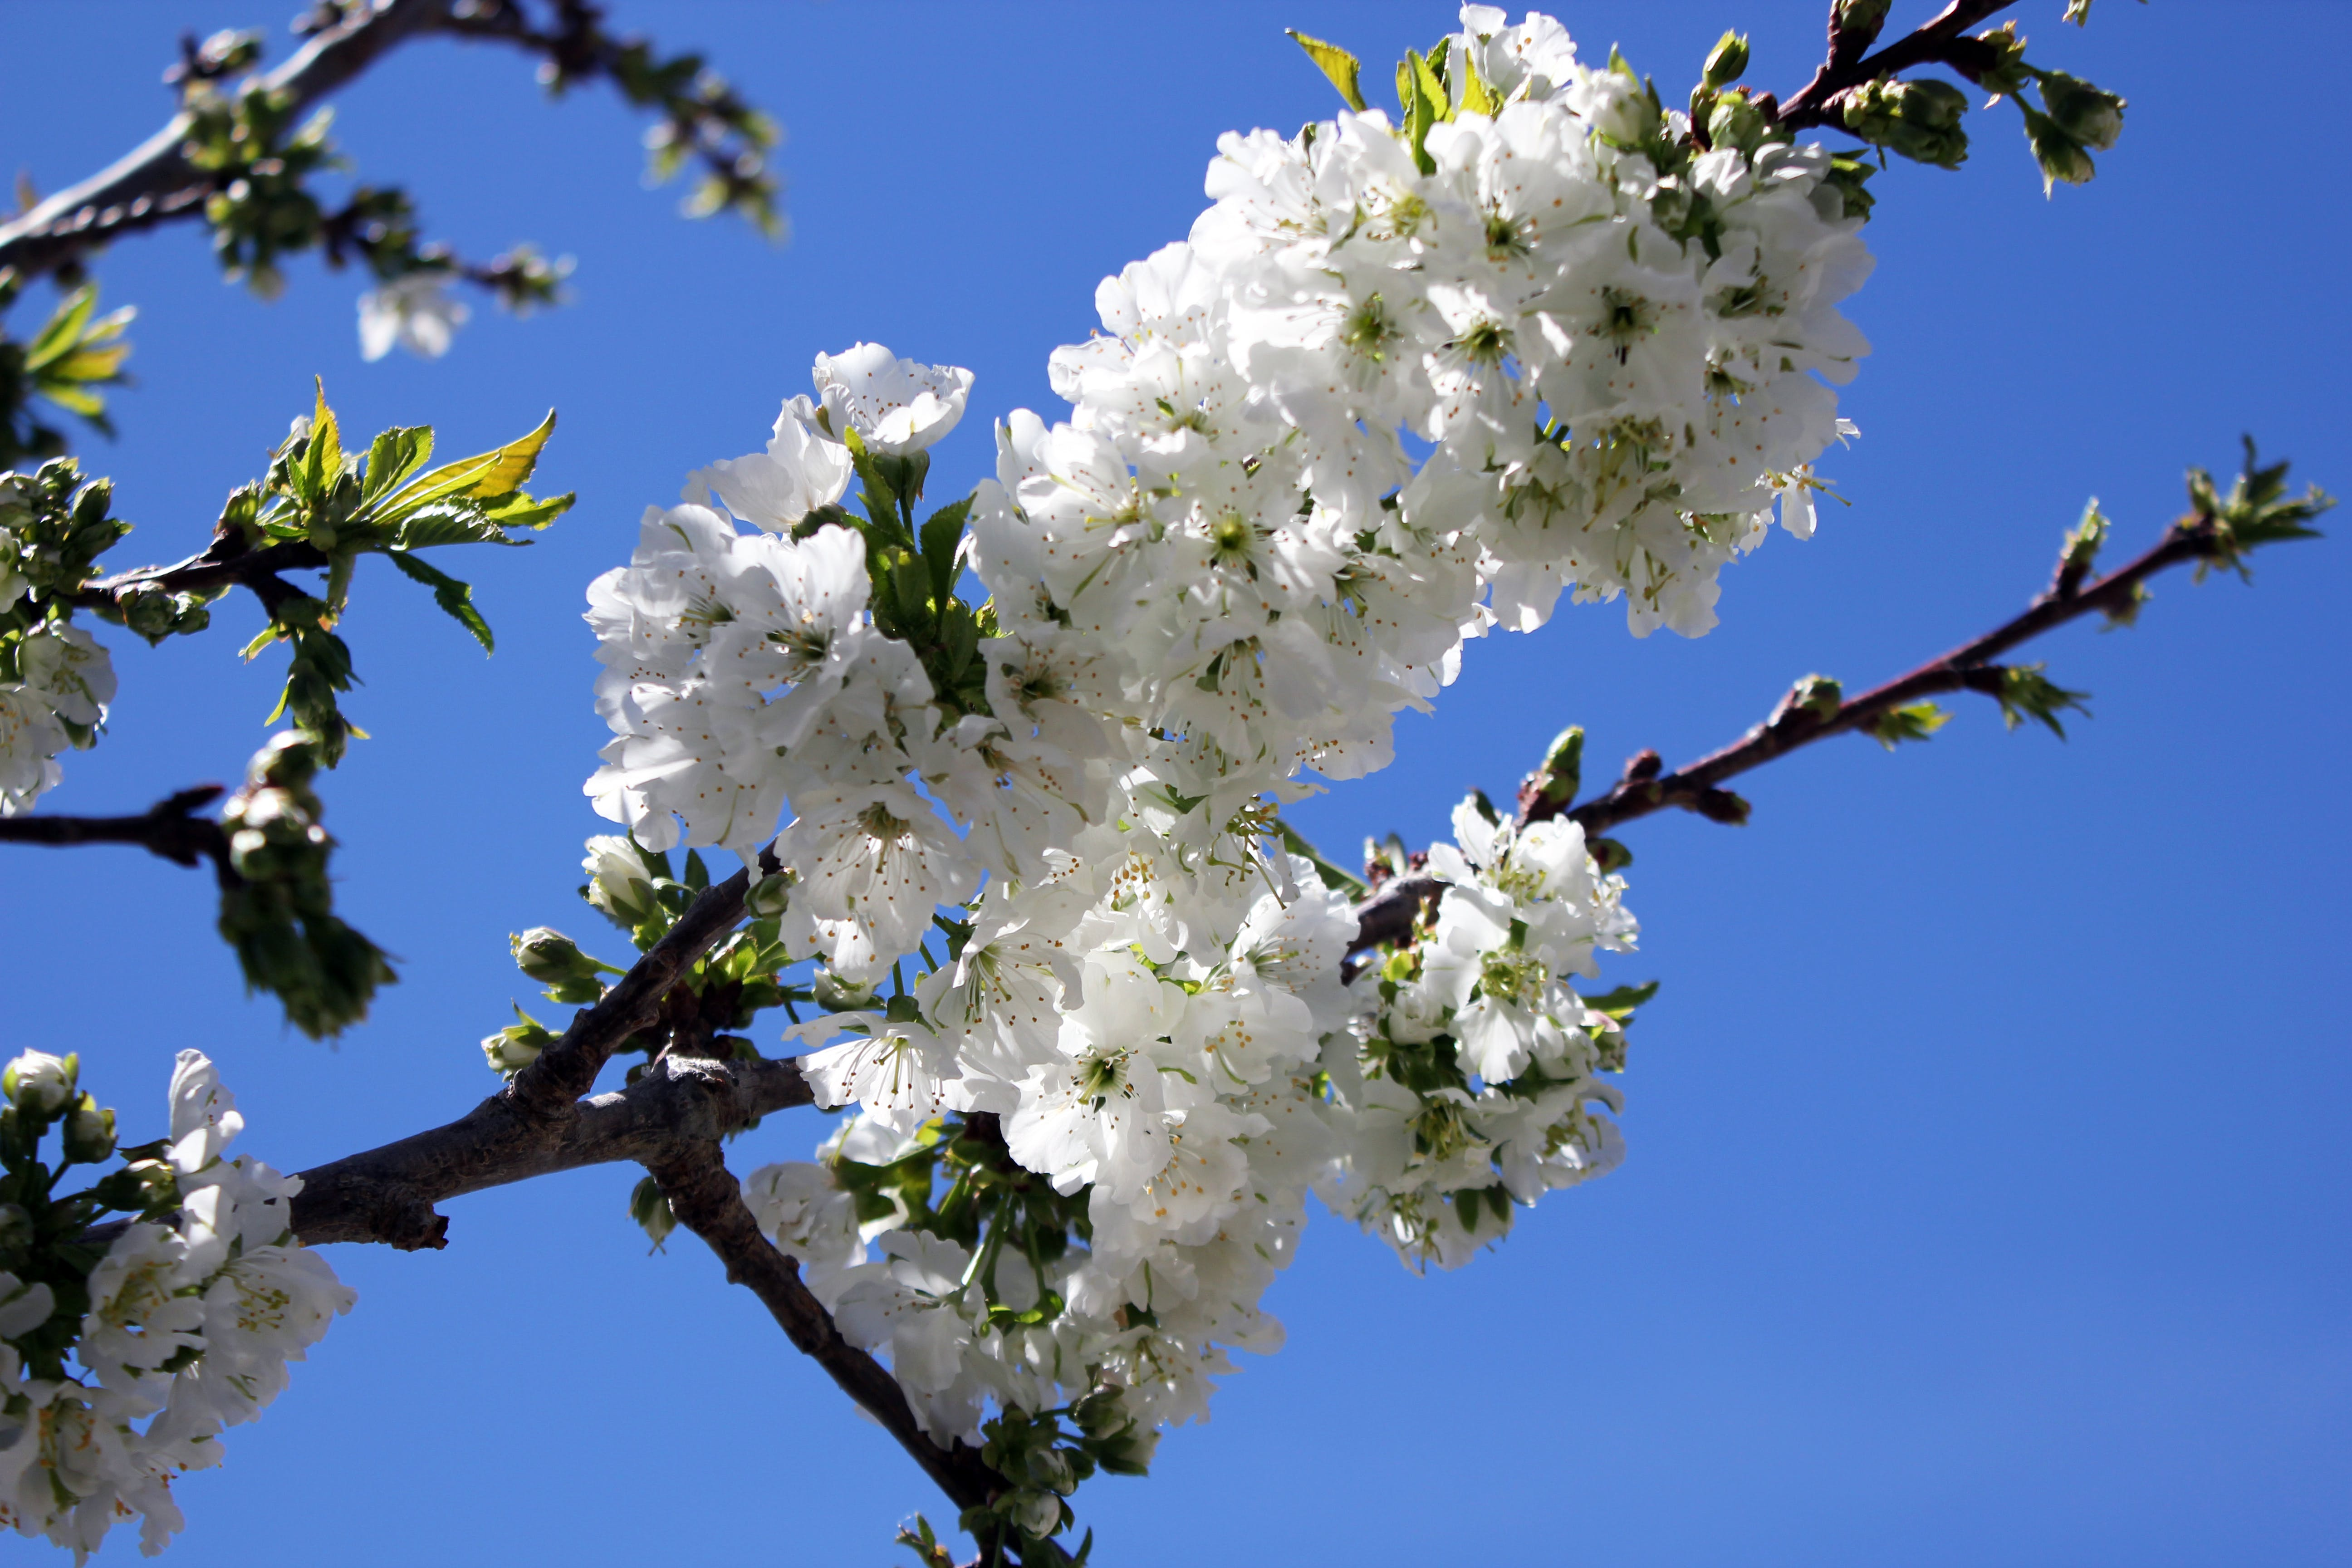 Free stock photo of cherry blossom, white blossom, white flowers